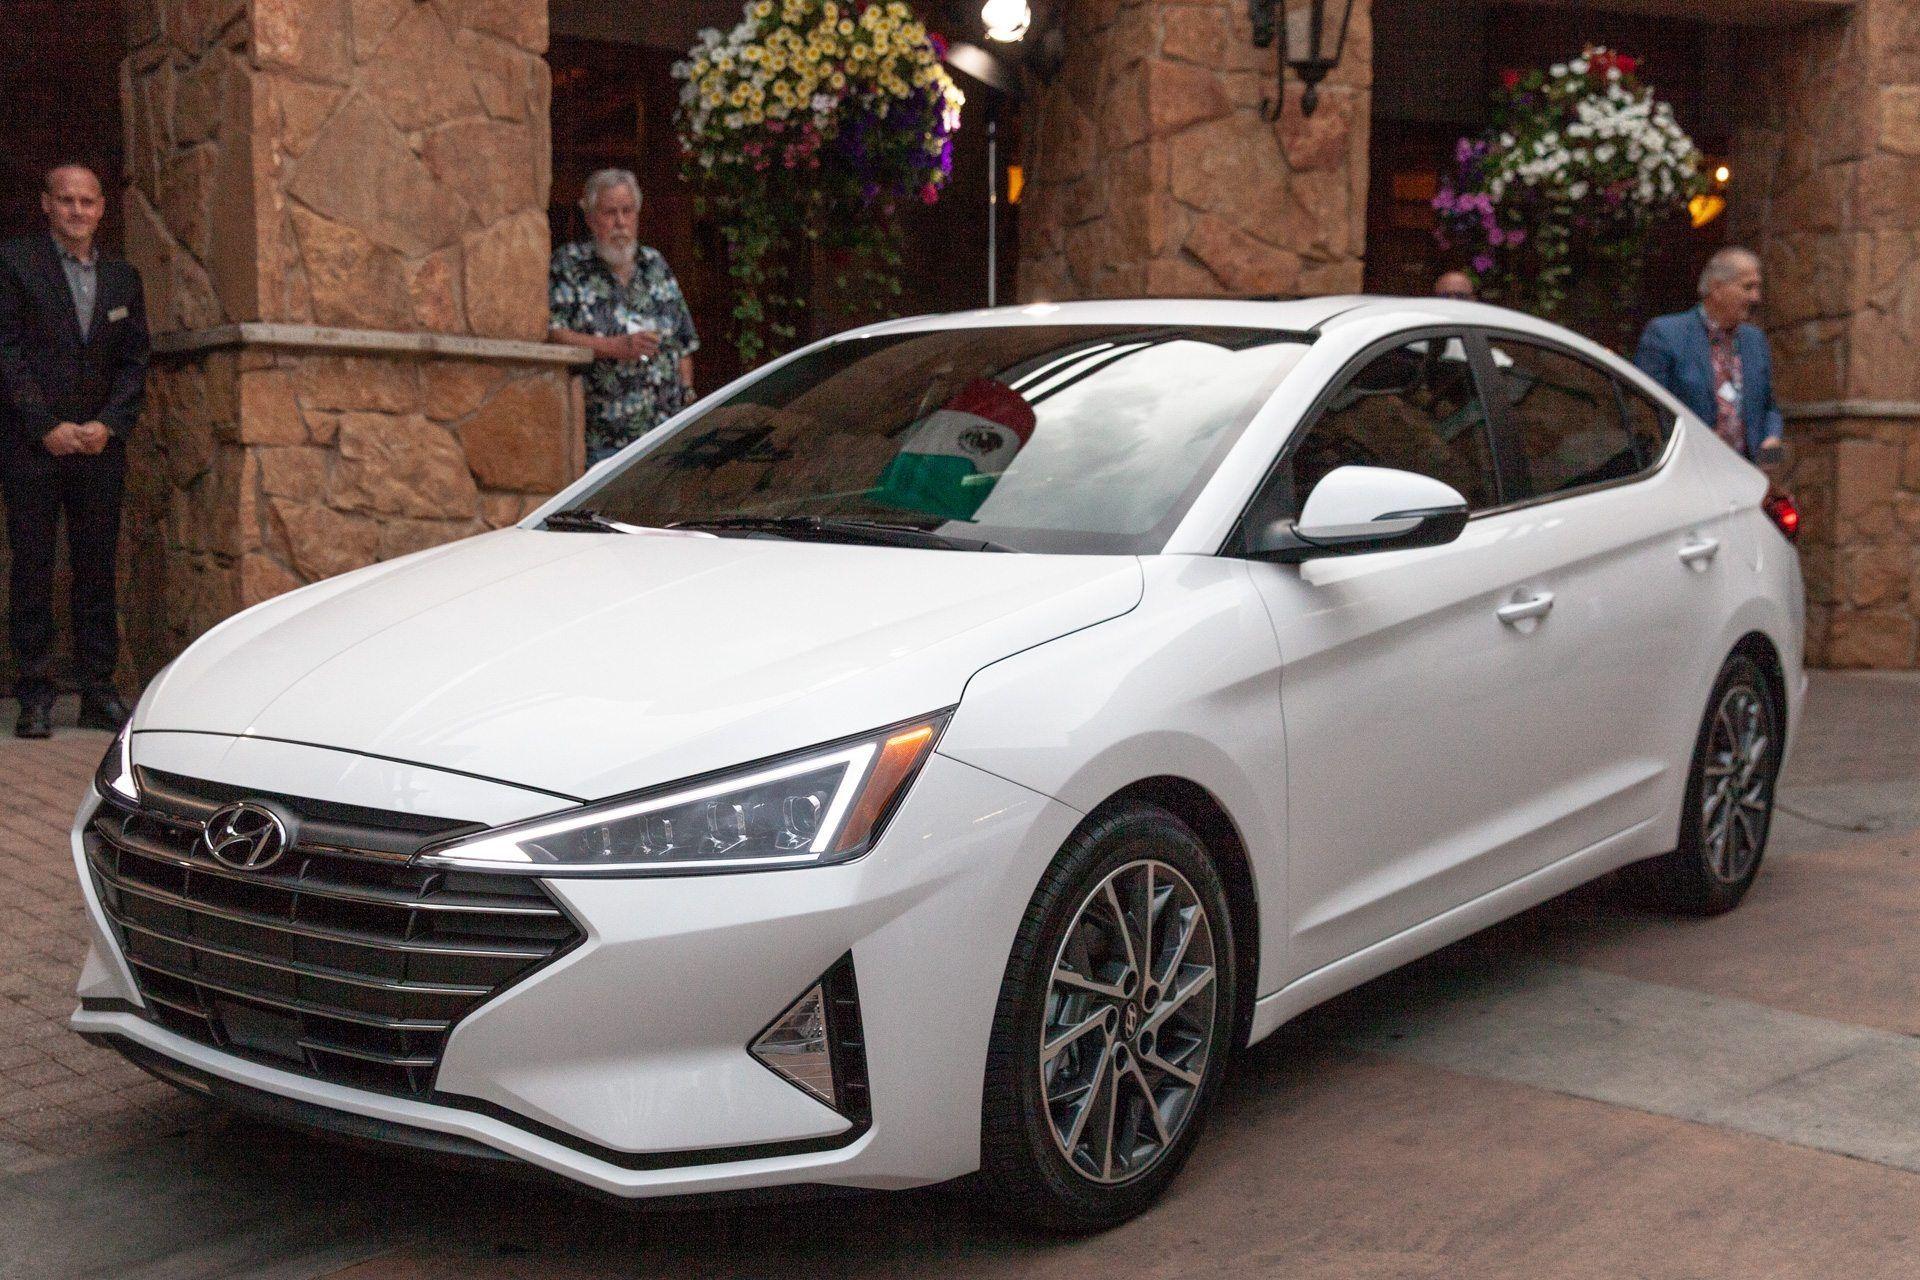 2019 Hyundai Elantra Gas Mileage Cars